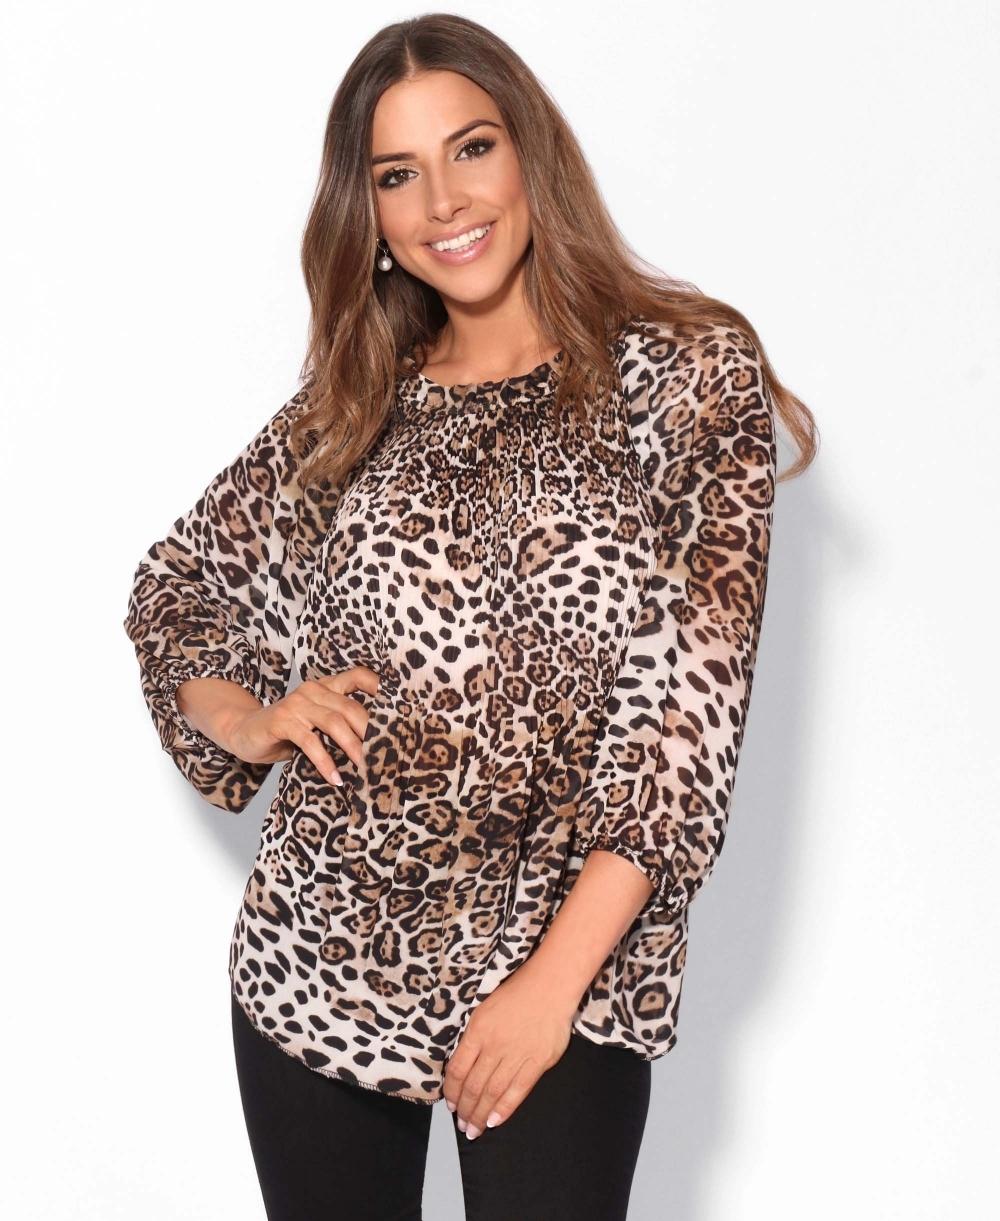 b505beb113d1c8 Blouses | Leopard Pleated Swing Chiffon Top | KRISP